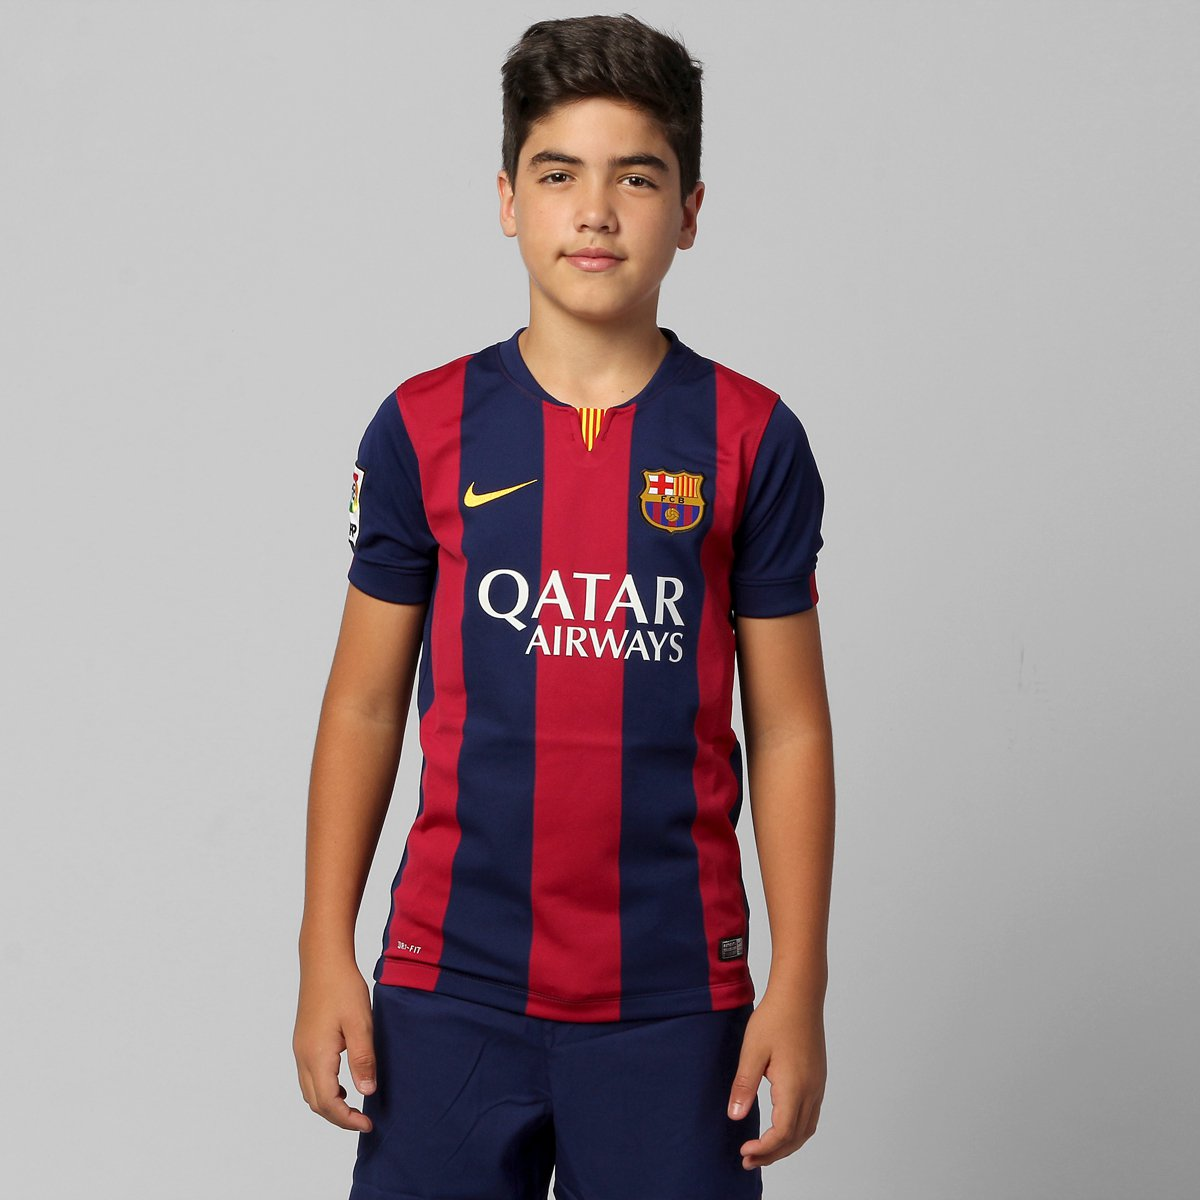 Camisa Nike Barcelona Home 14 15 s nº Infantil - Compre Agora  d4b7ce4ed36